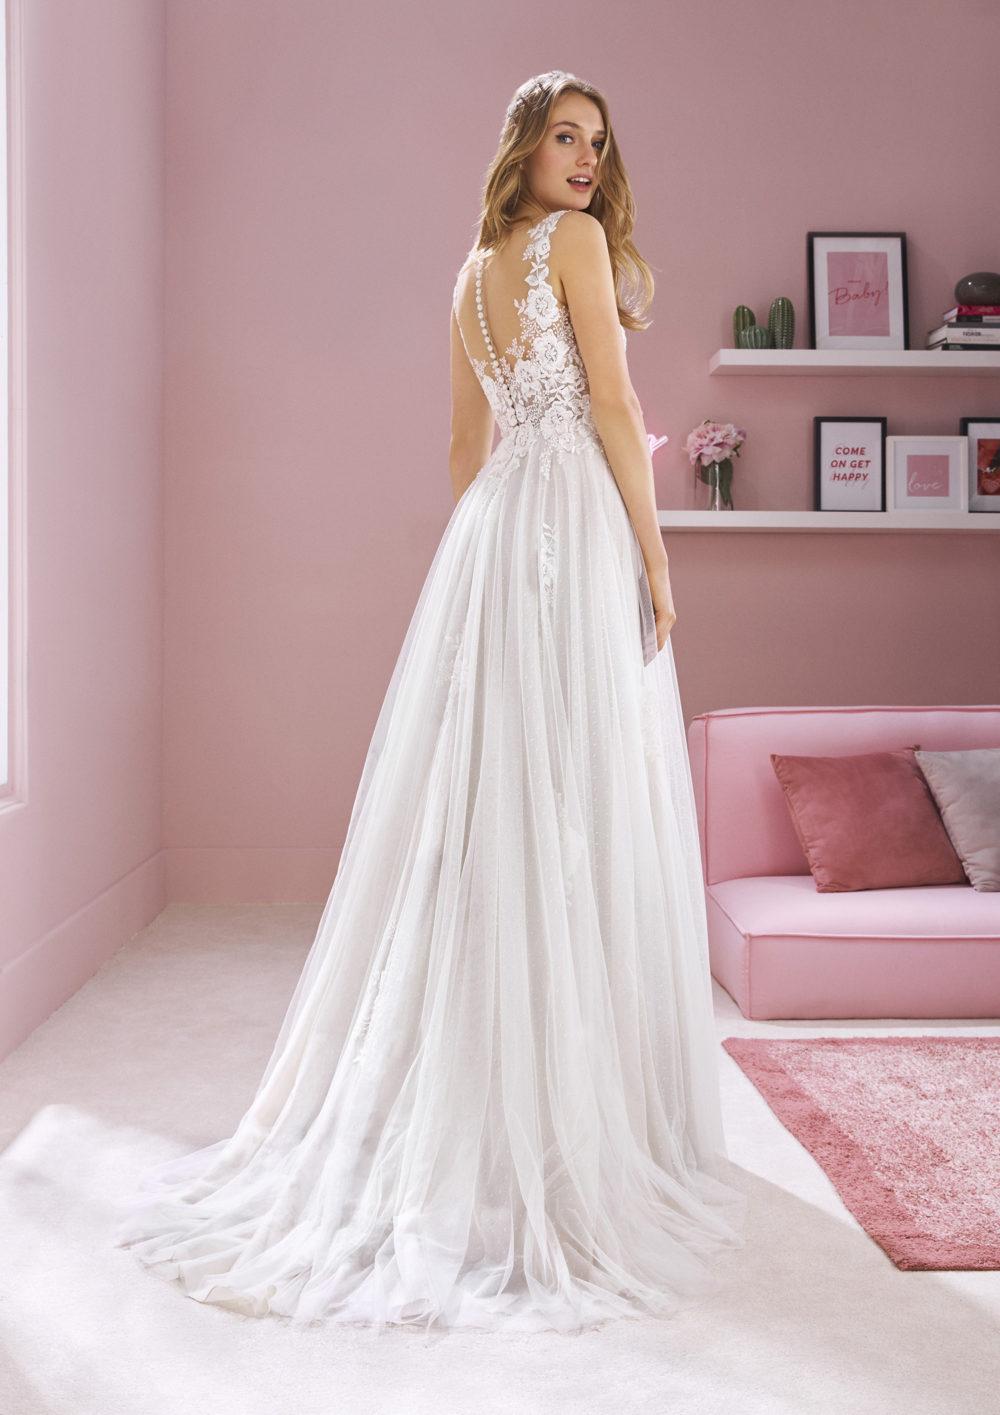 Mariages: abito da sposa Poème 2020 a Vicenza, Verona, Padova, Veneto MEGAN